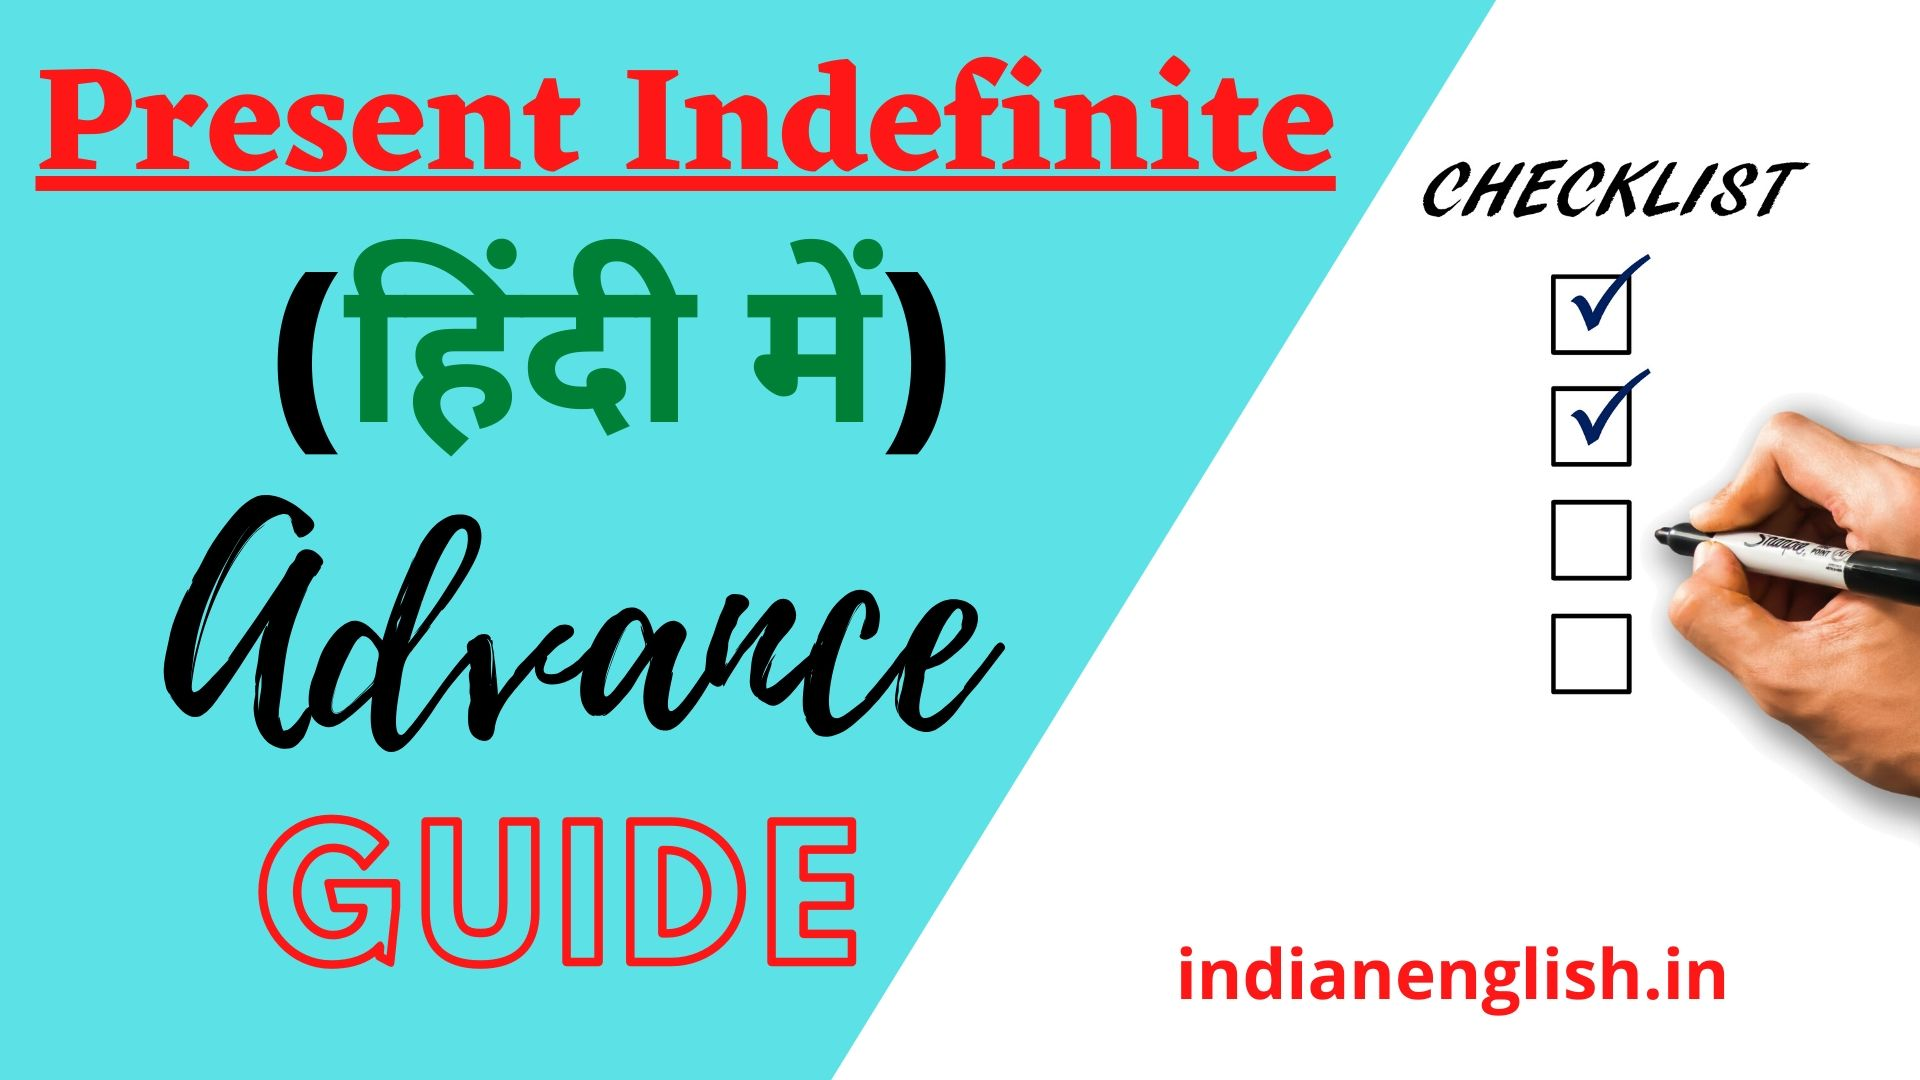 Present indefinite tense in hindi